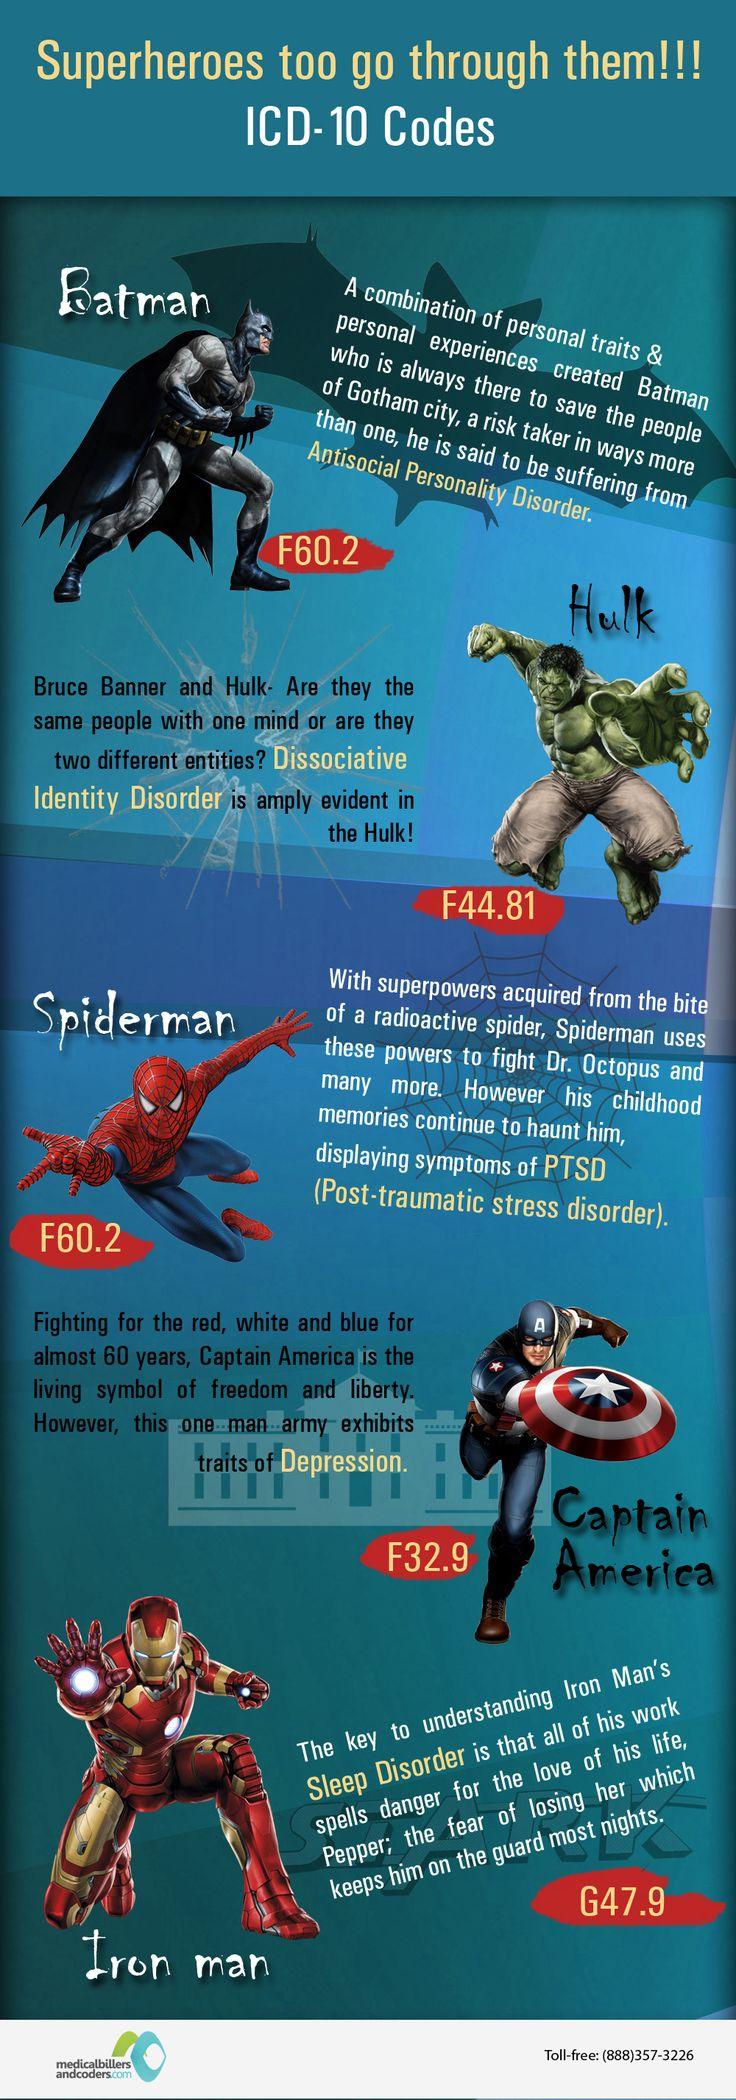 ICD-10 Codes - Superheroes go through them too :-)